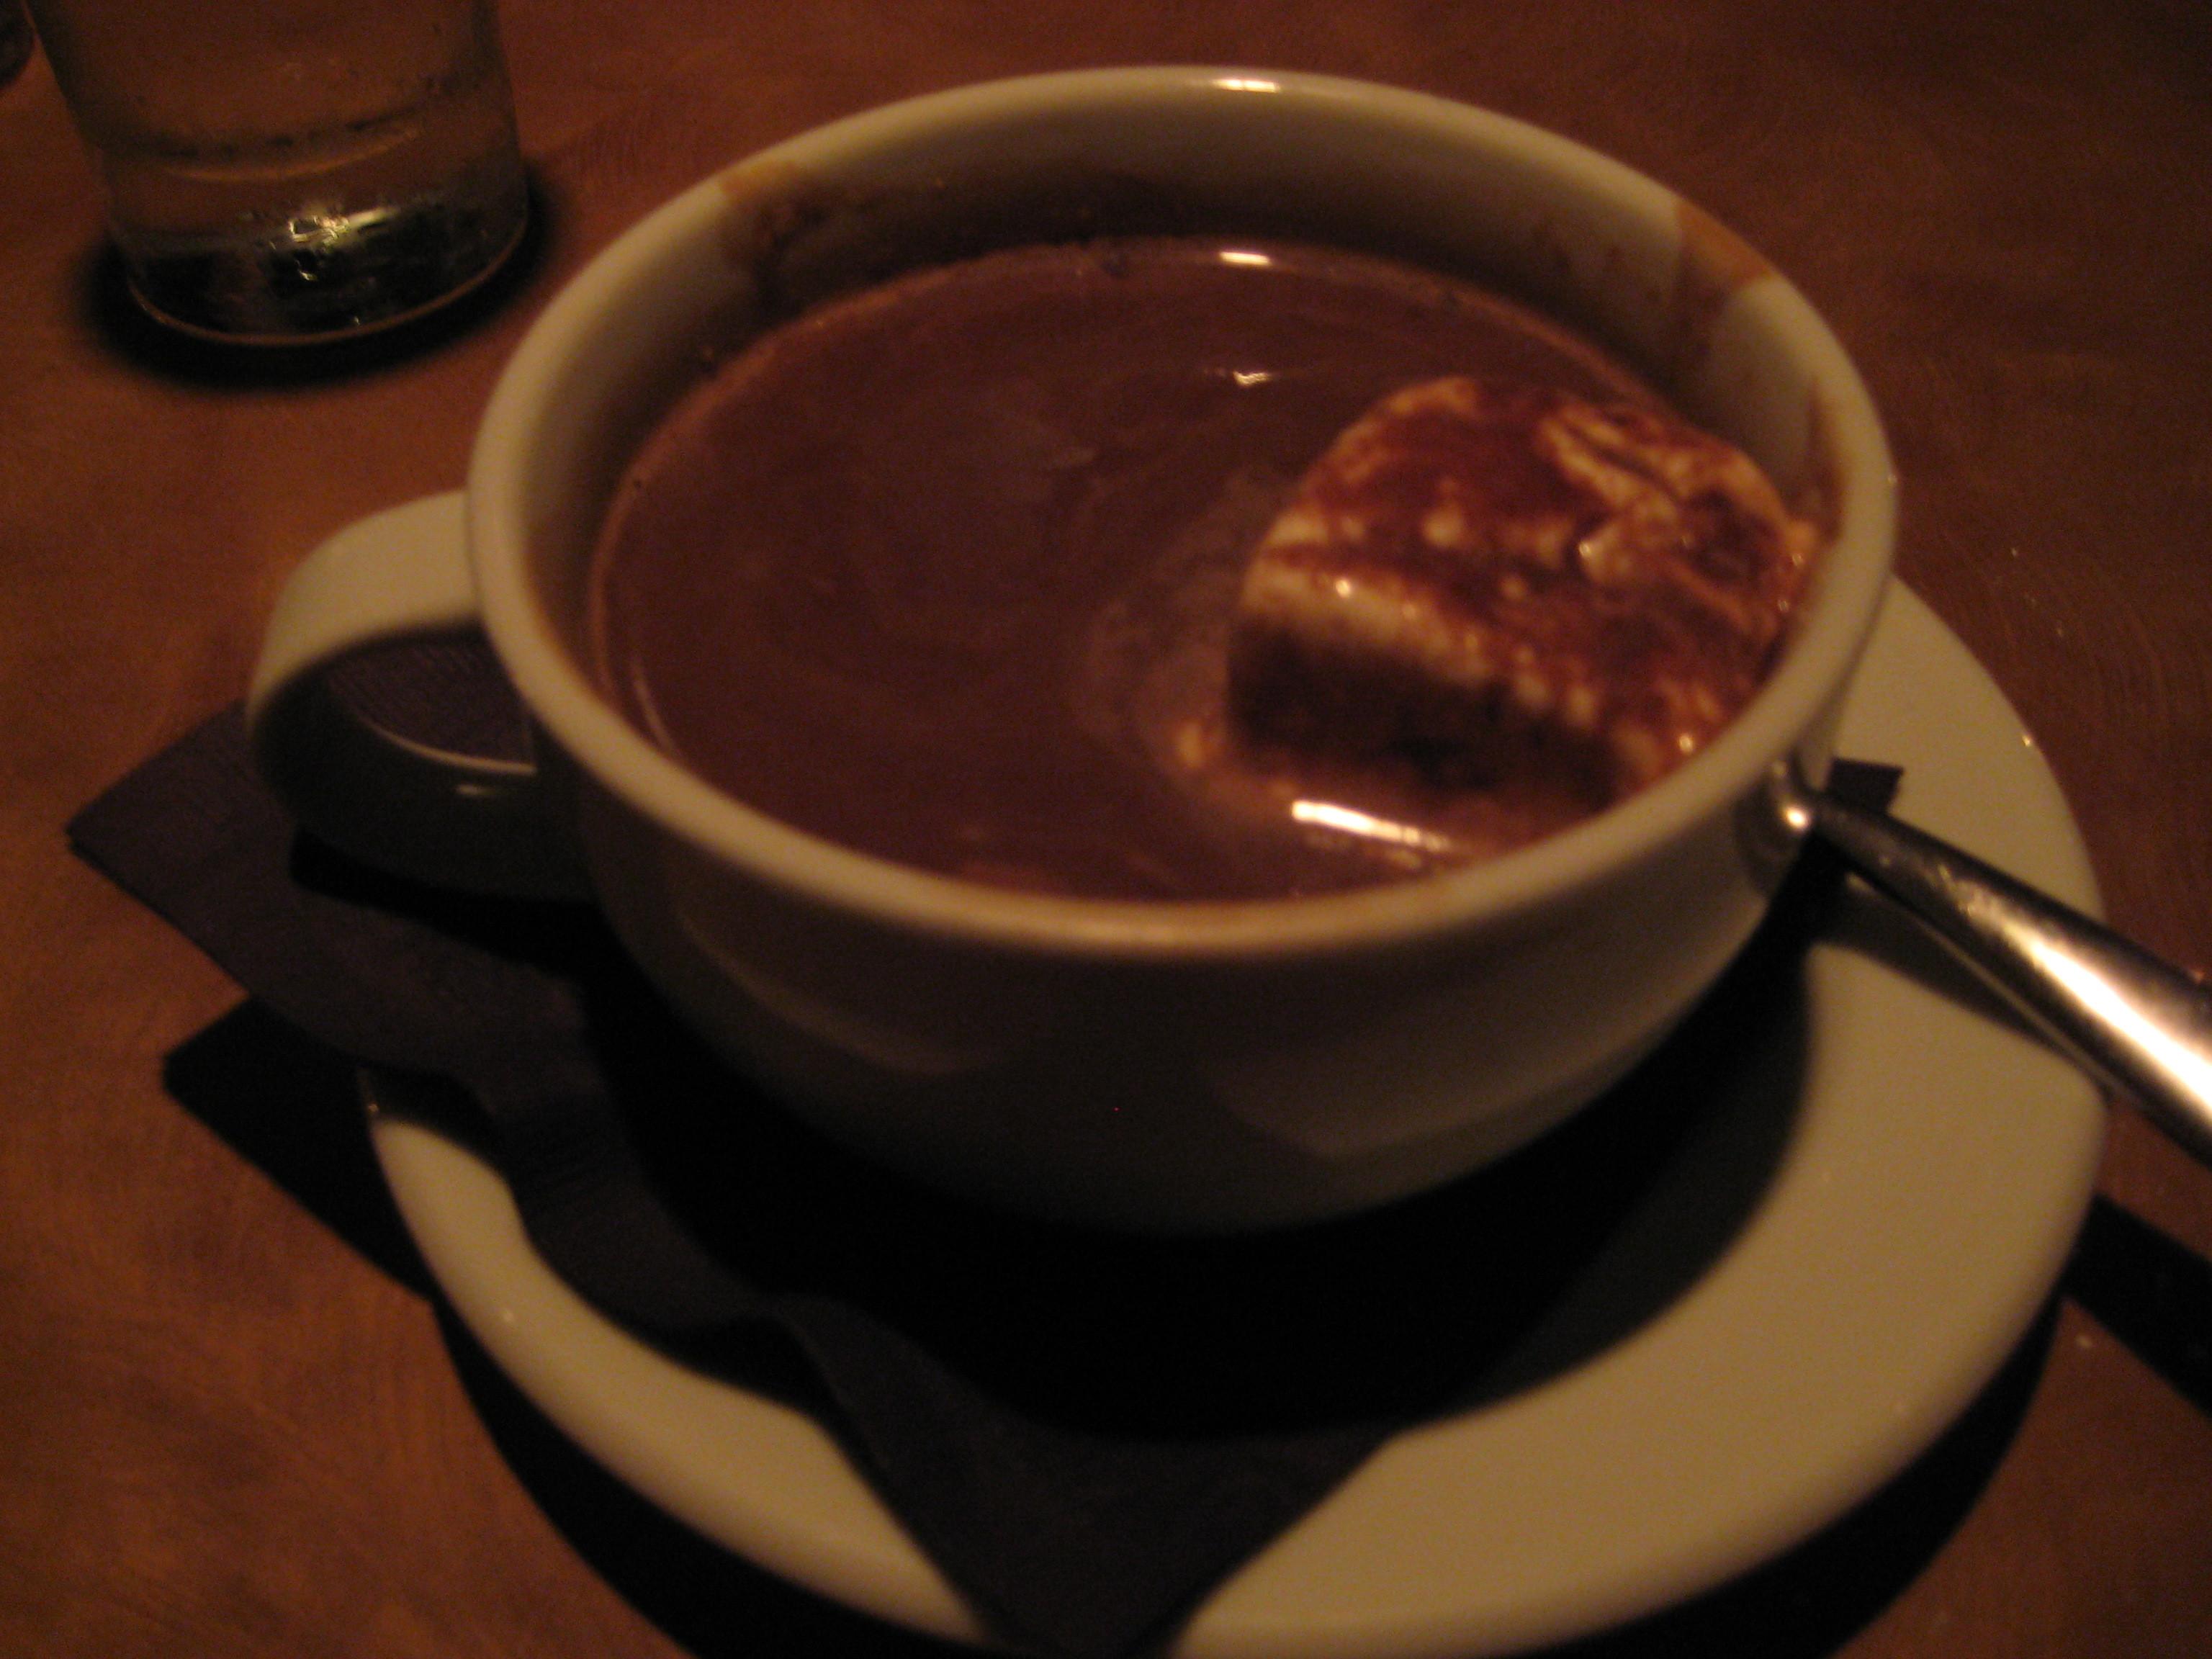 Hot Chocolate Chicago  Mindy's Hot Chocolate Restraurant Dessert Bar Pastries